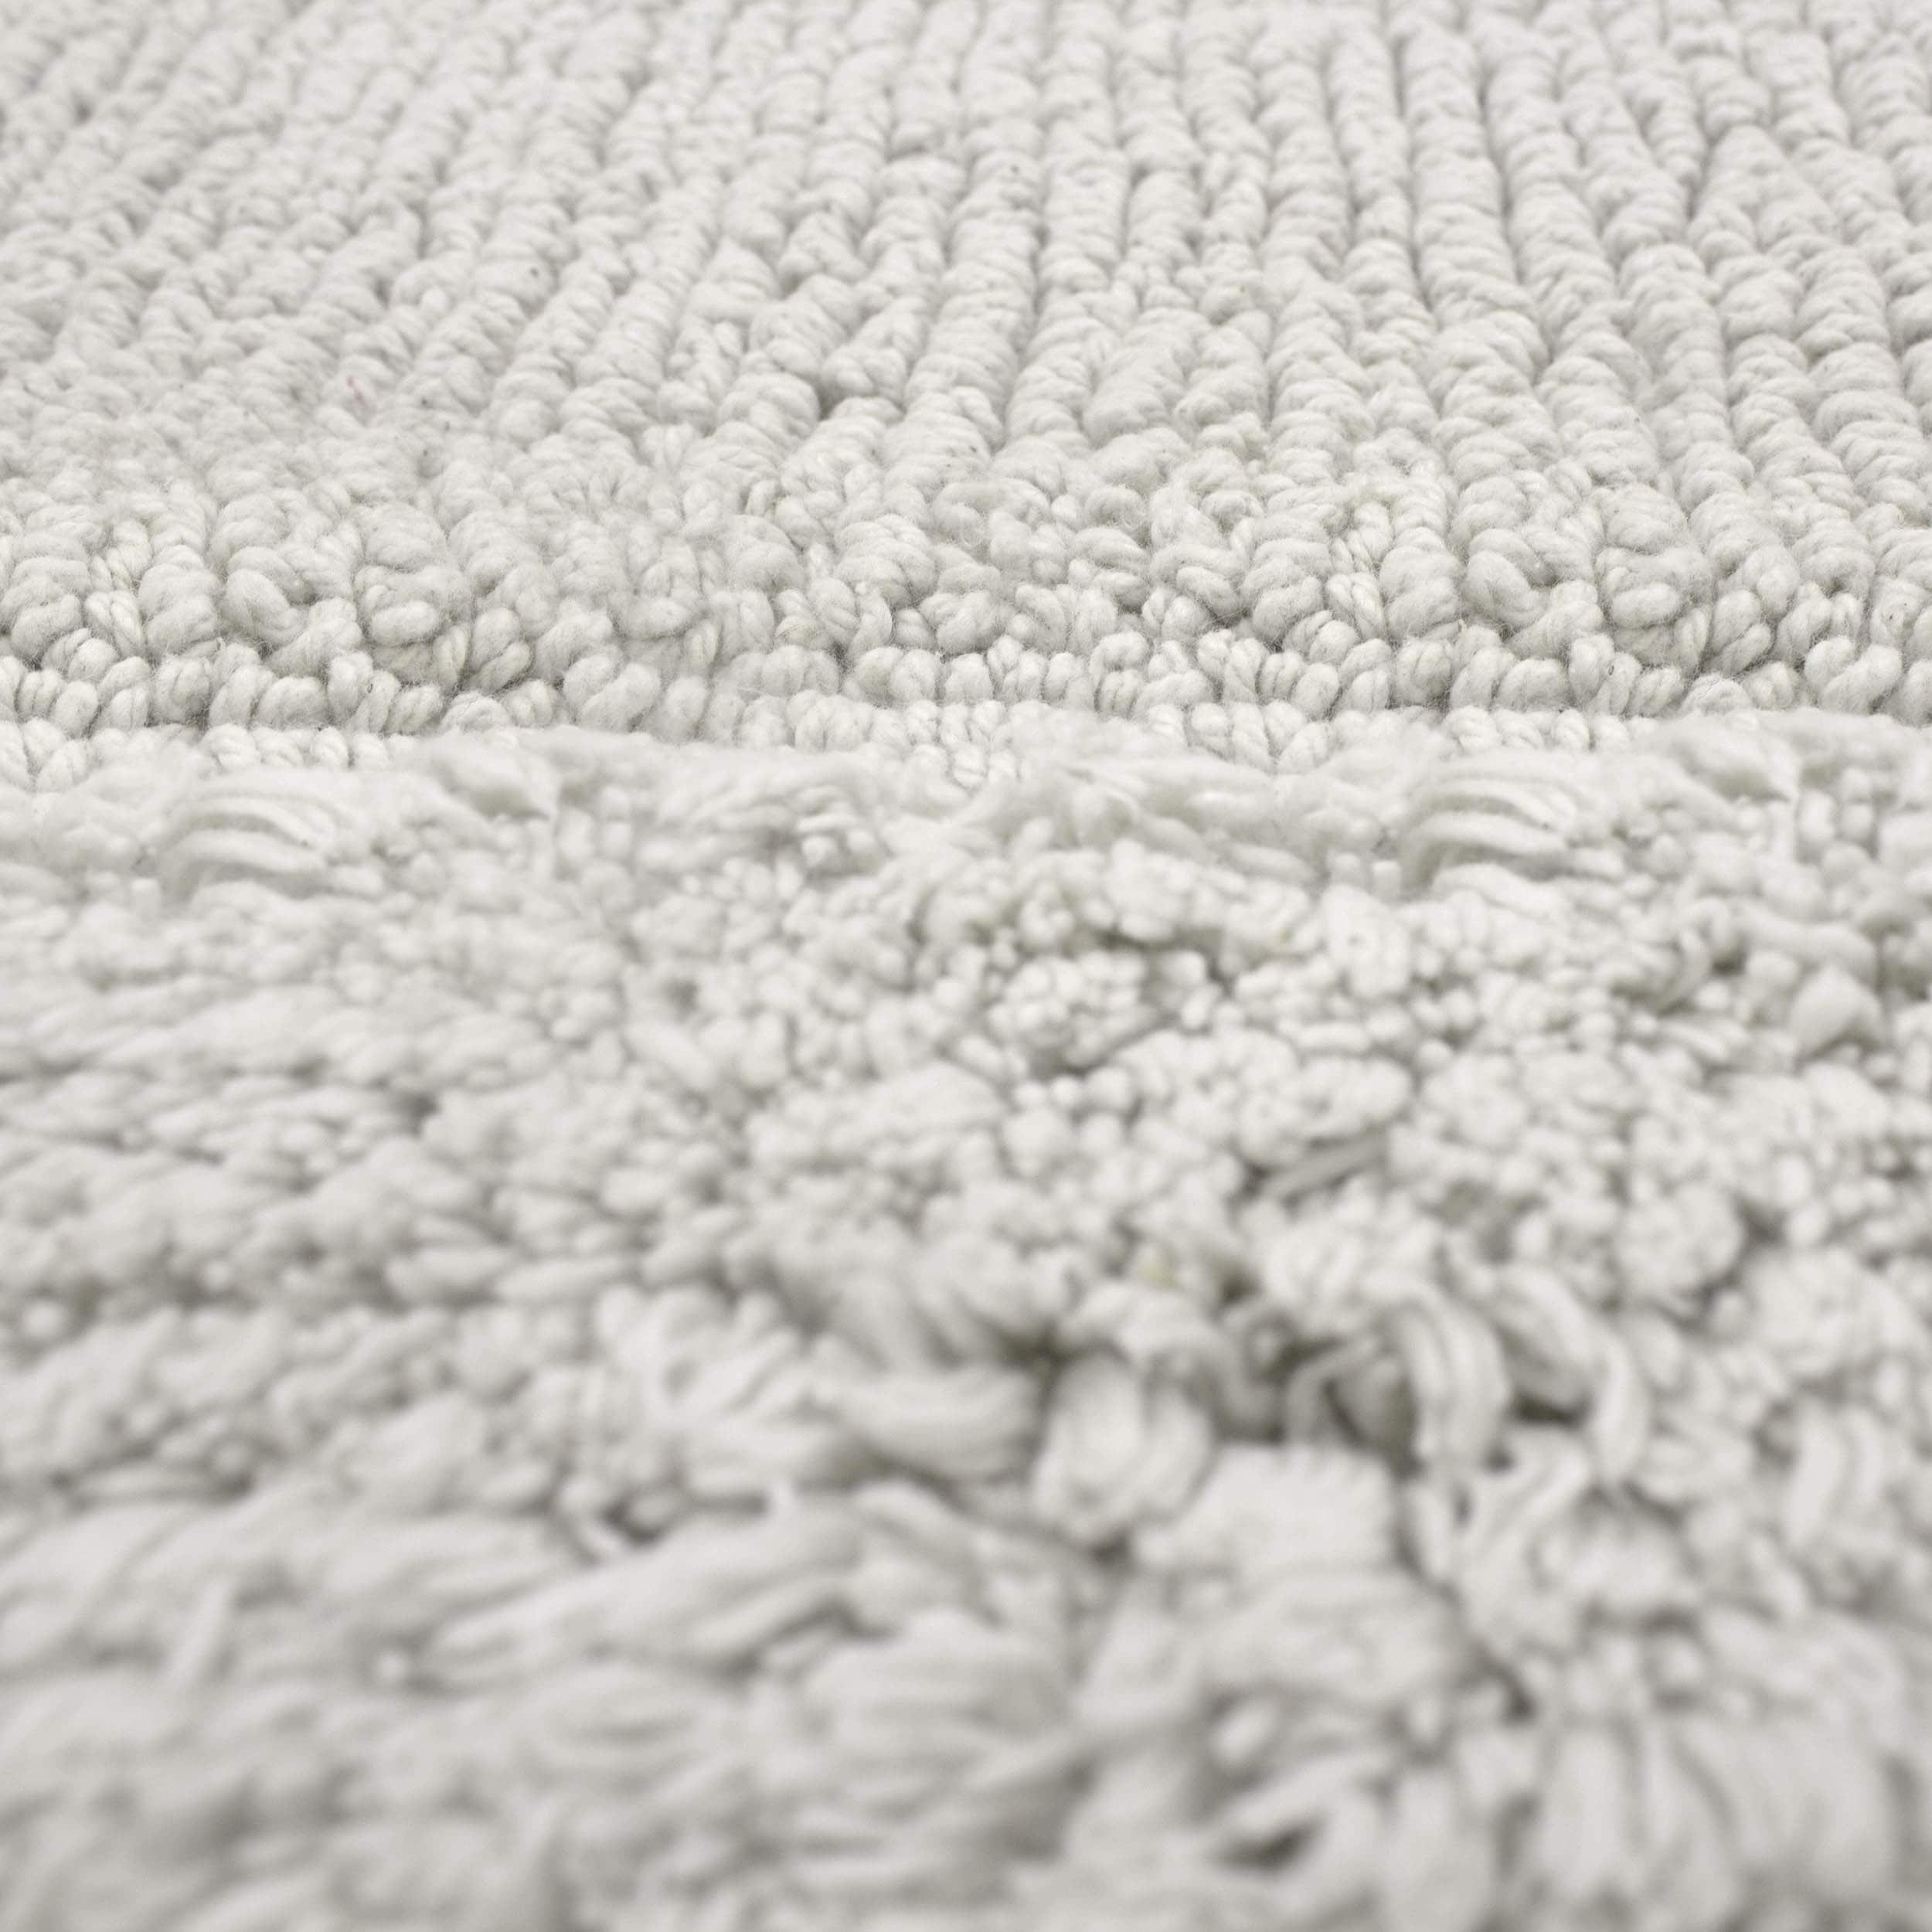 pdx long reviews plyh bath wayfair plymouth piece bathroom home bed rug set trellis